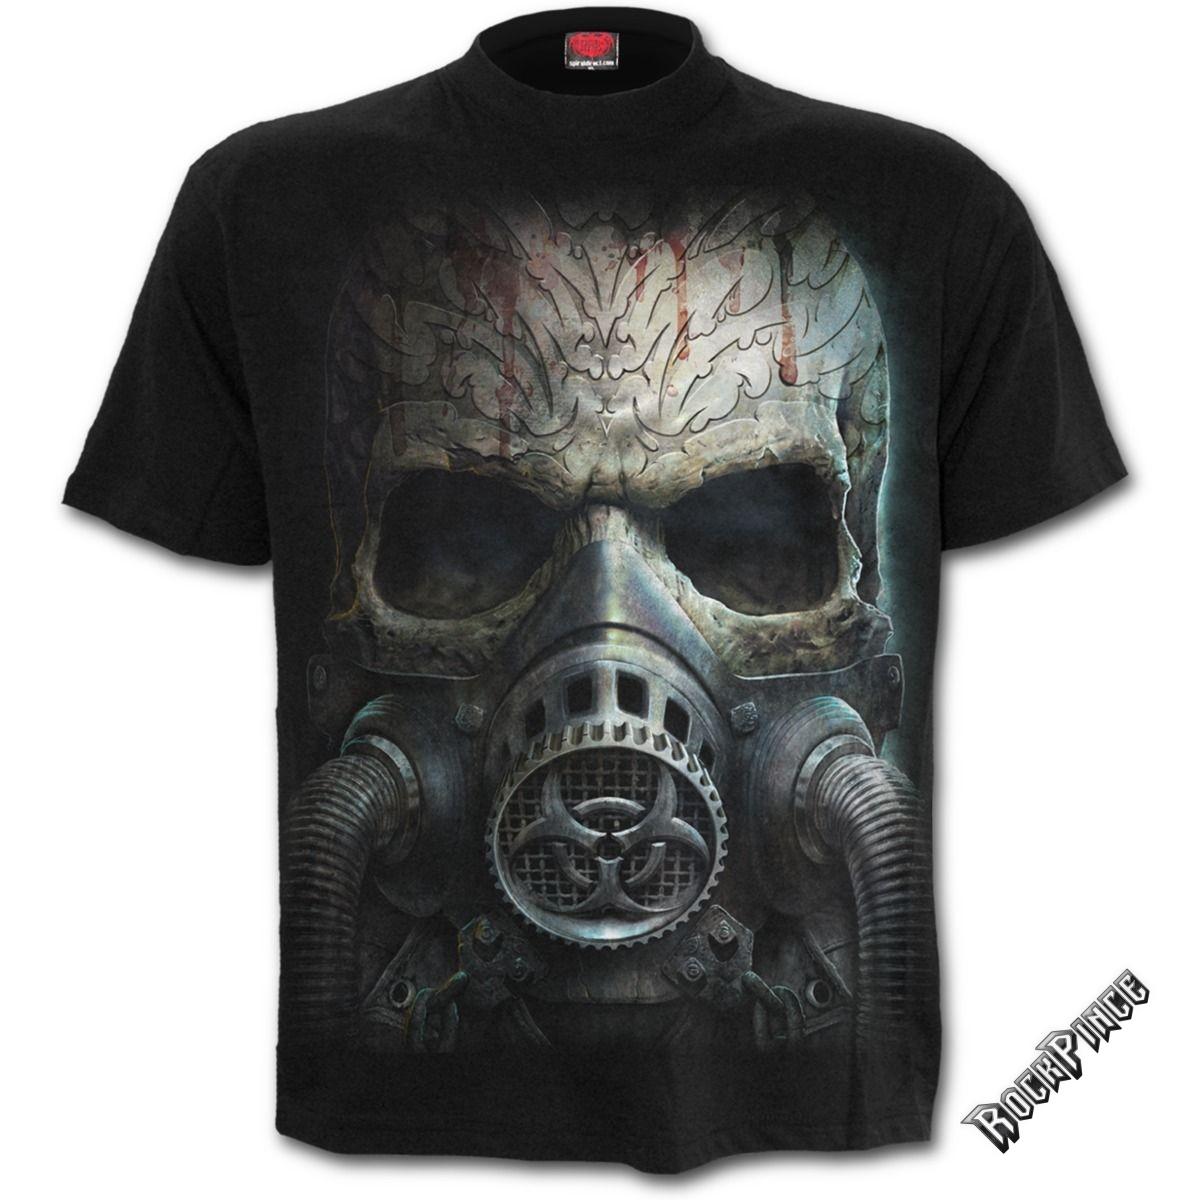 BIO-SKULL - T-Shirt Black - M024M101